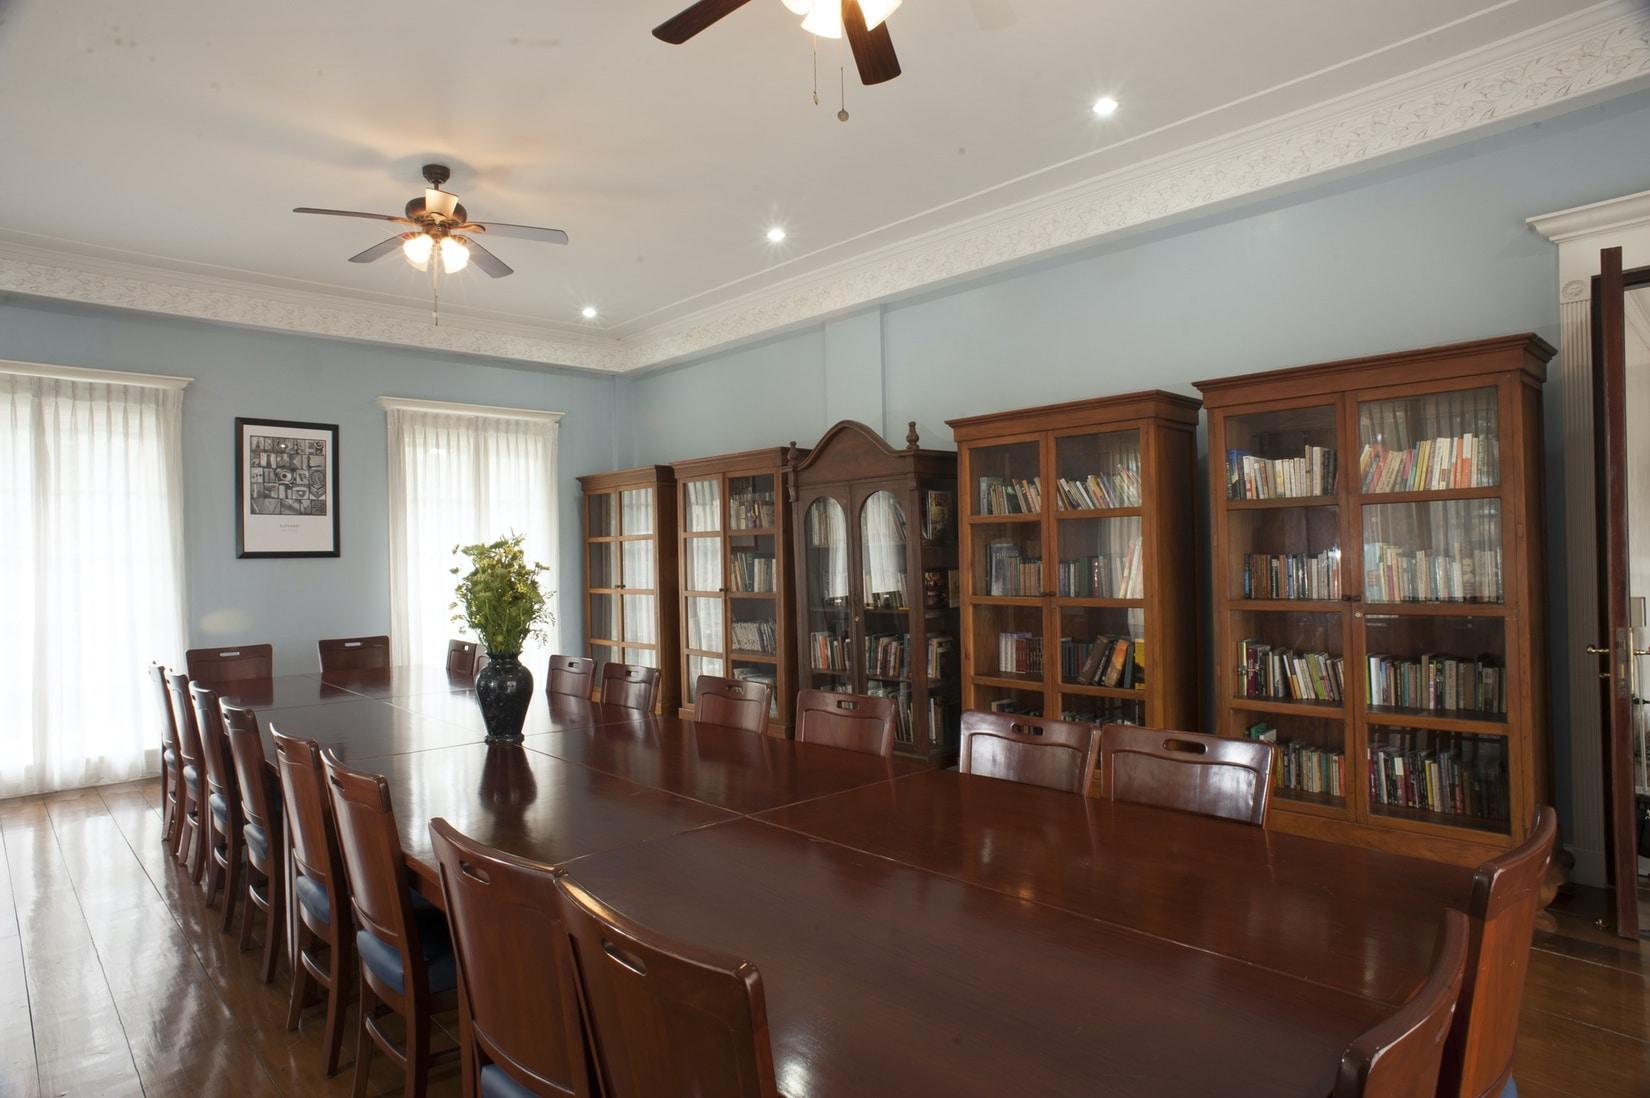 Library Frangeli House Baguio 0